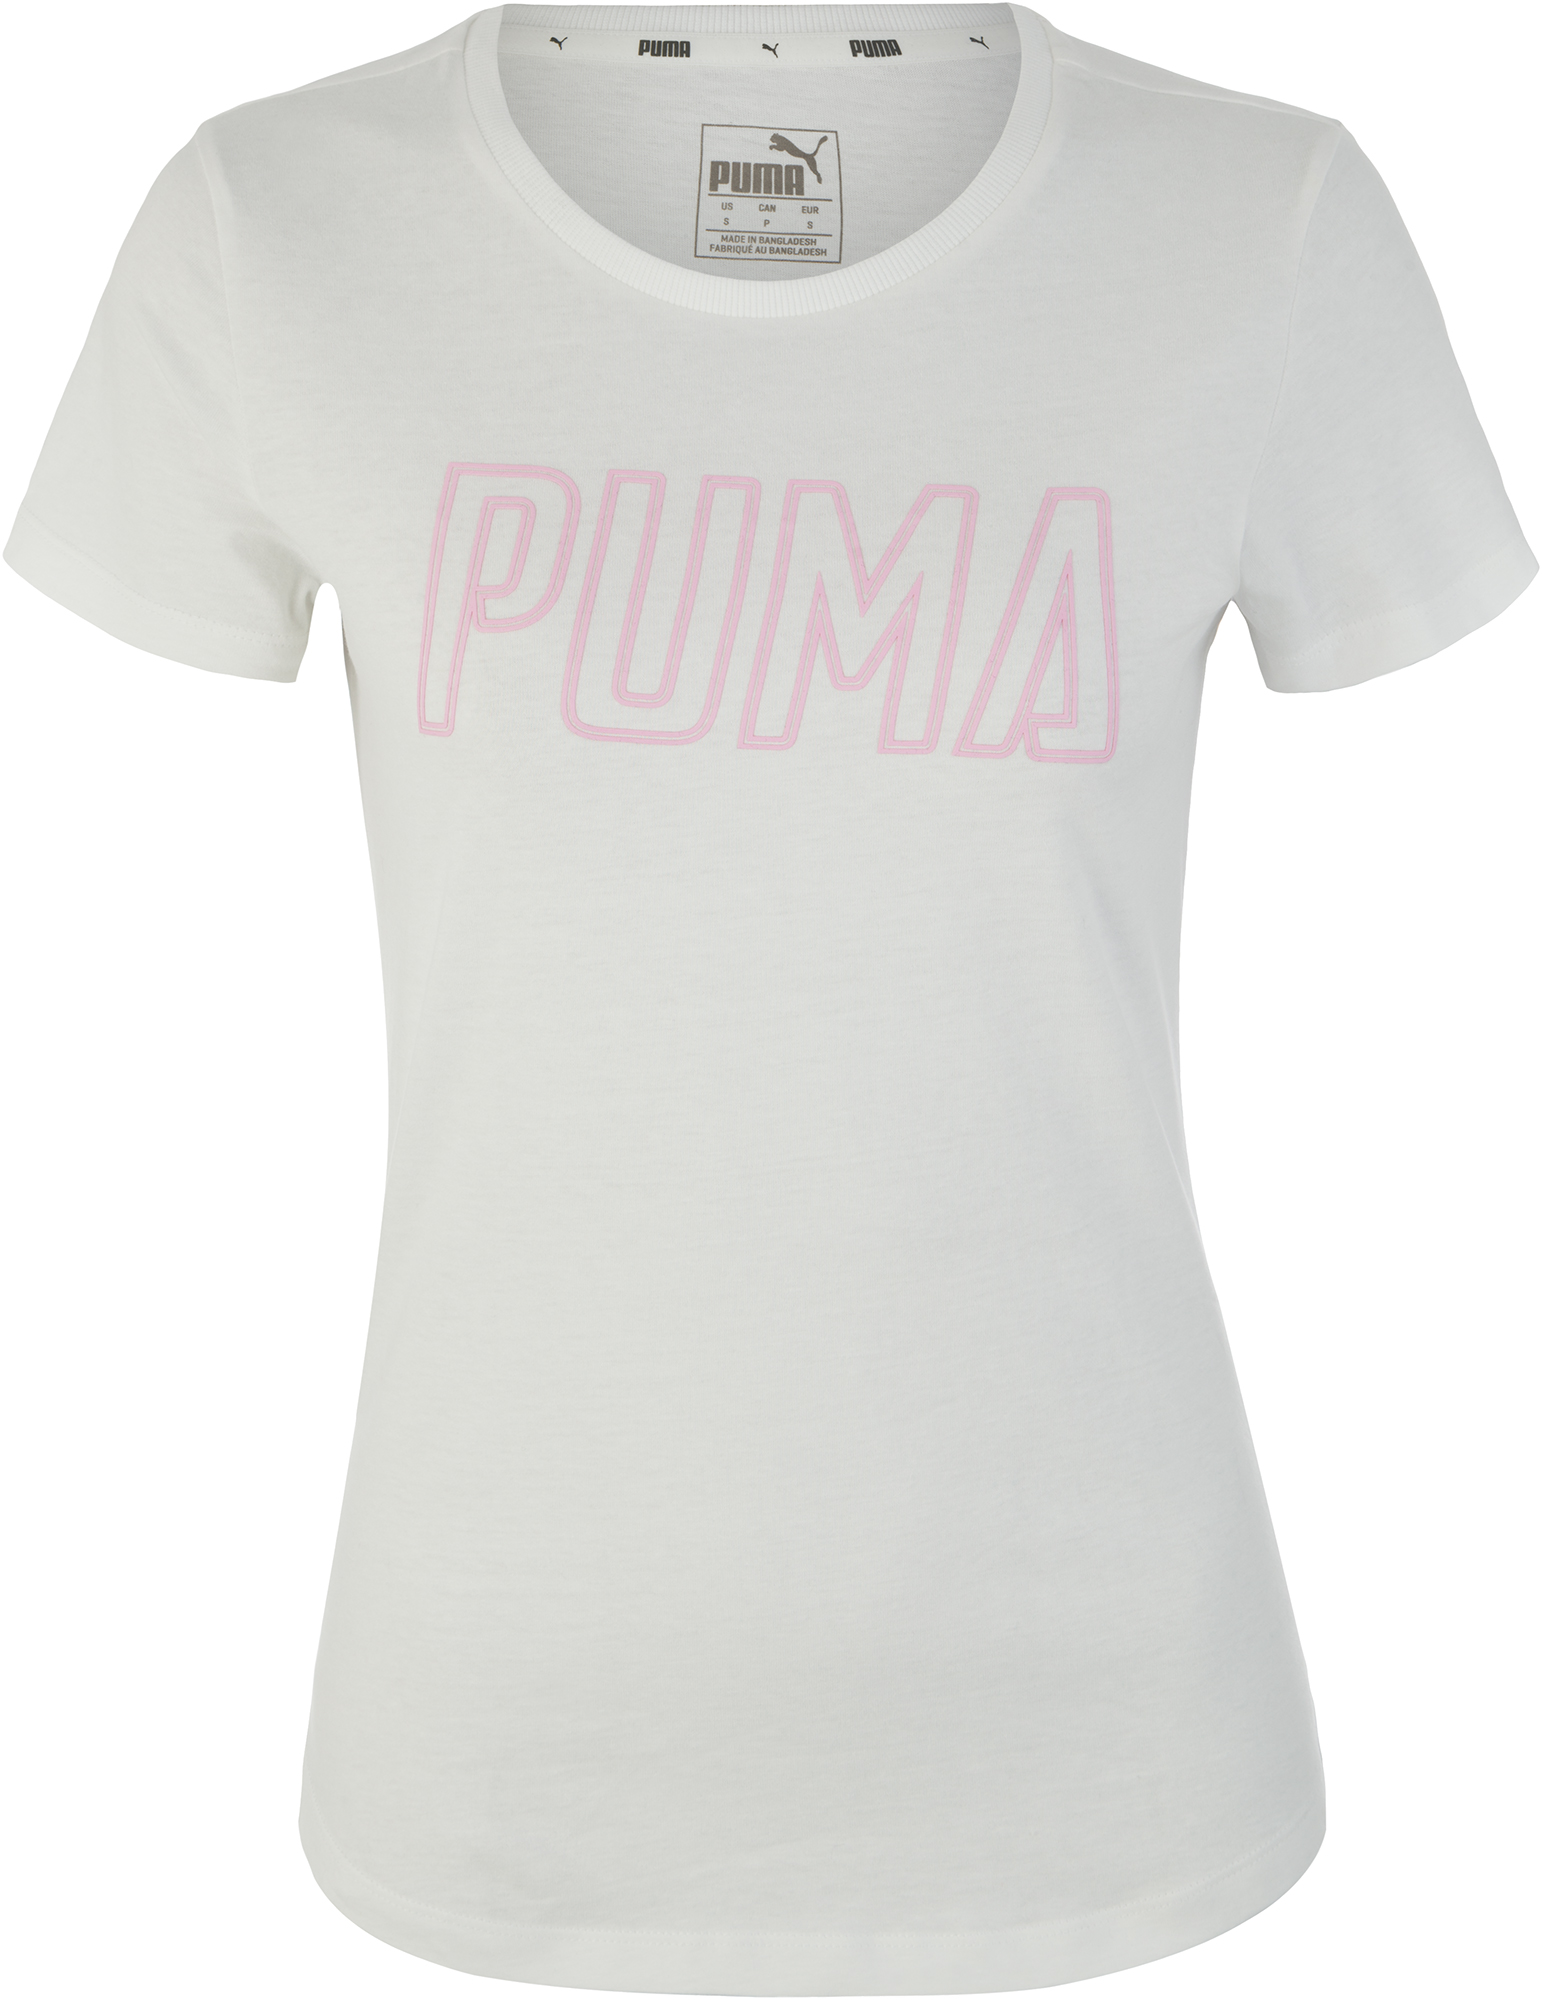 Puma Футболка женская Puma Athletics, размер 46-48 цена 2017